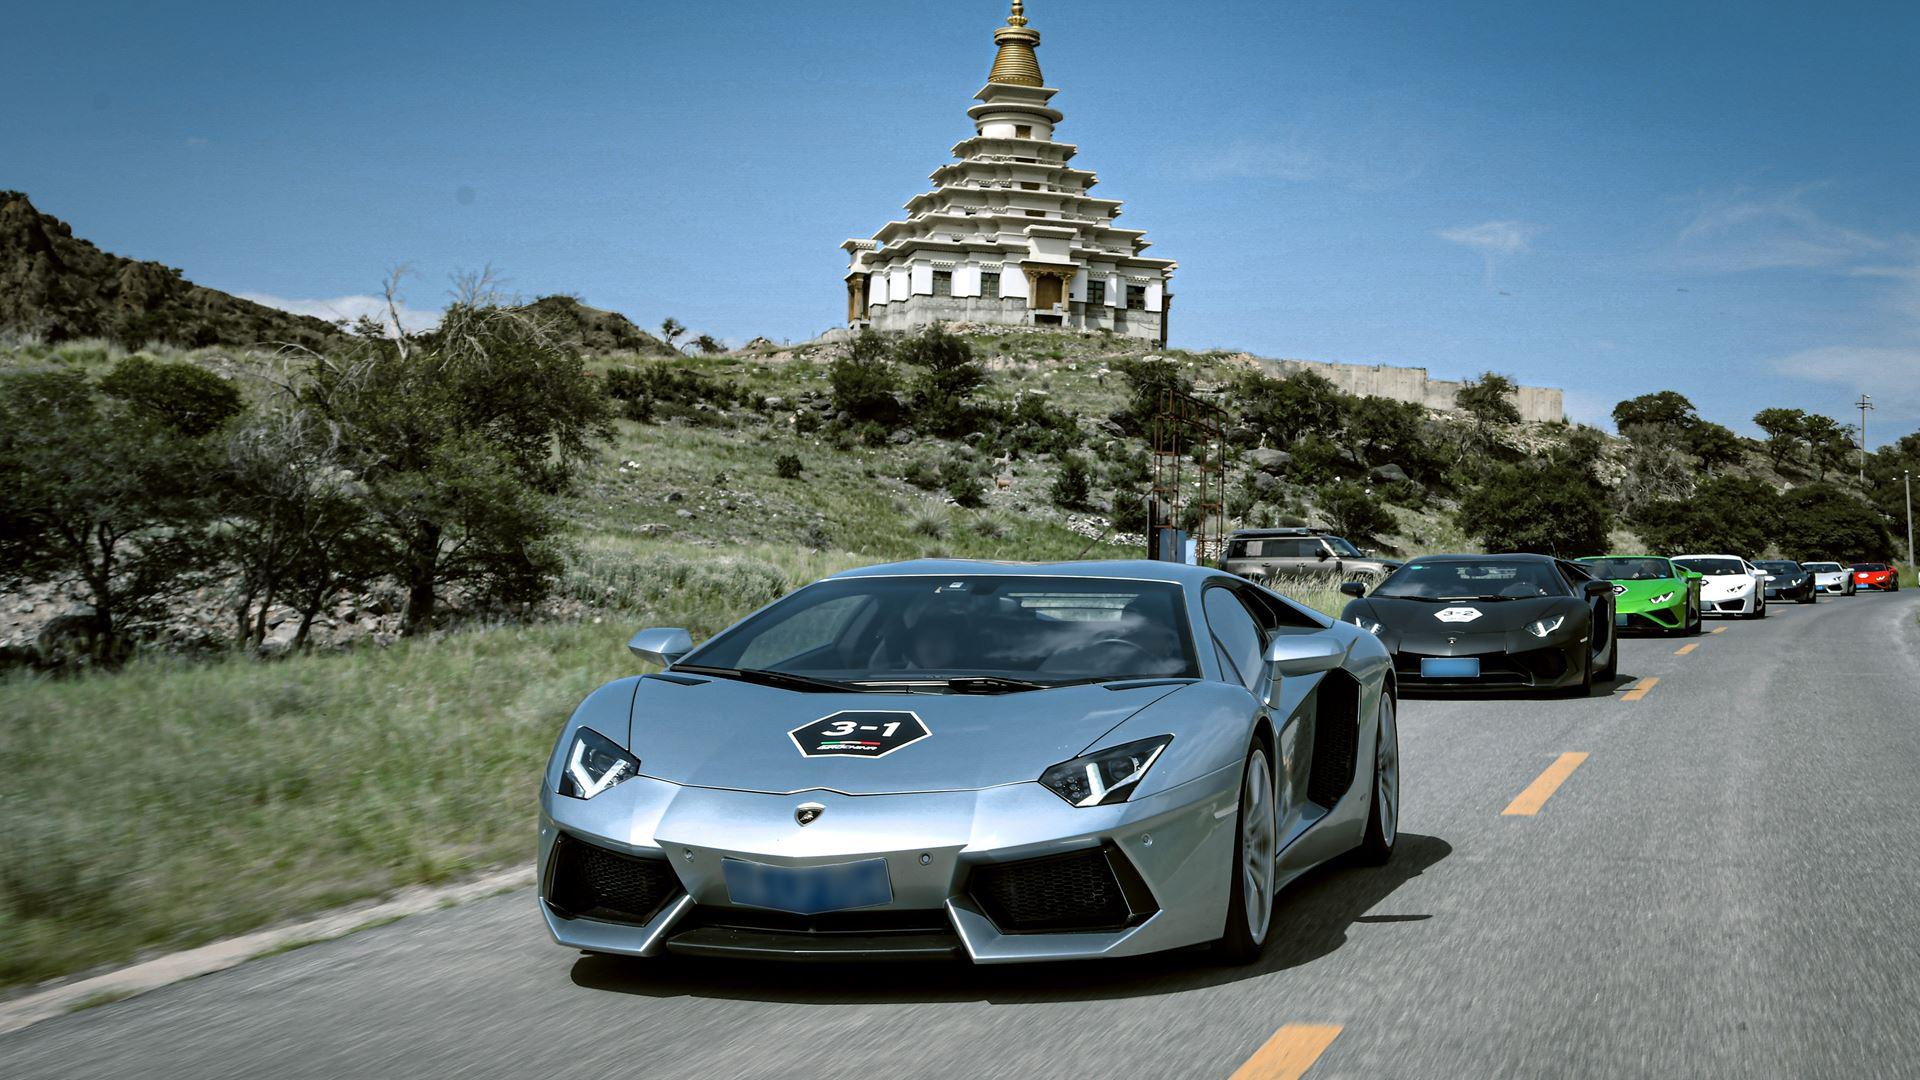 "Lamborghini Esperienza Giro ""Journey into the Vast"" Unparalleled expedition of 42 Lamborghinis through the North West of China - Image 1"